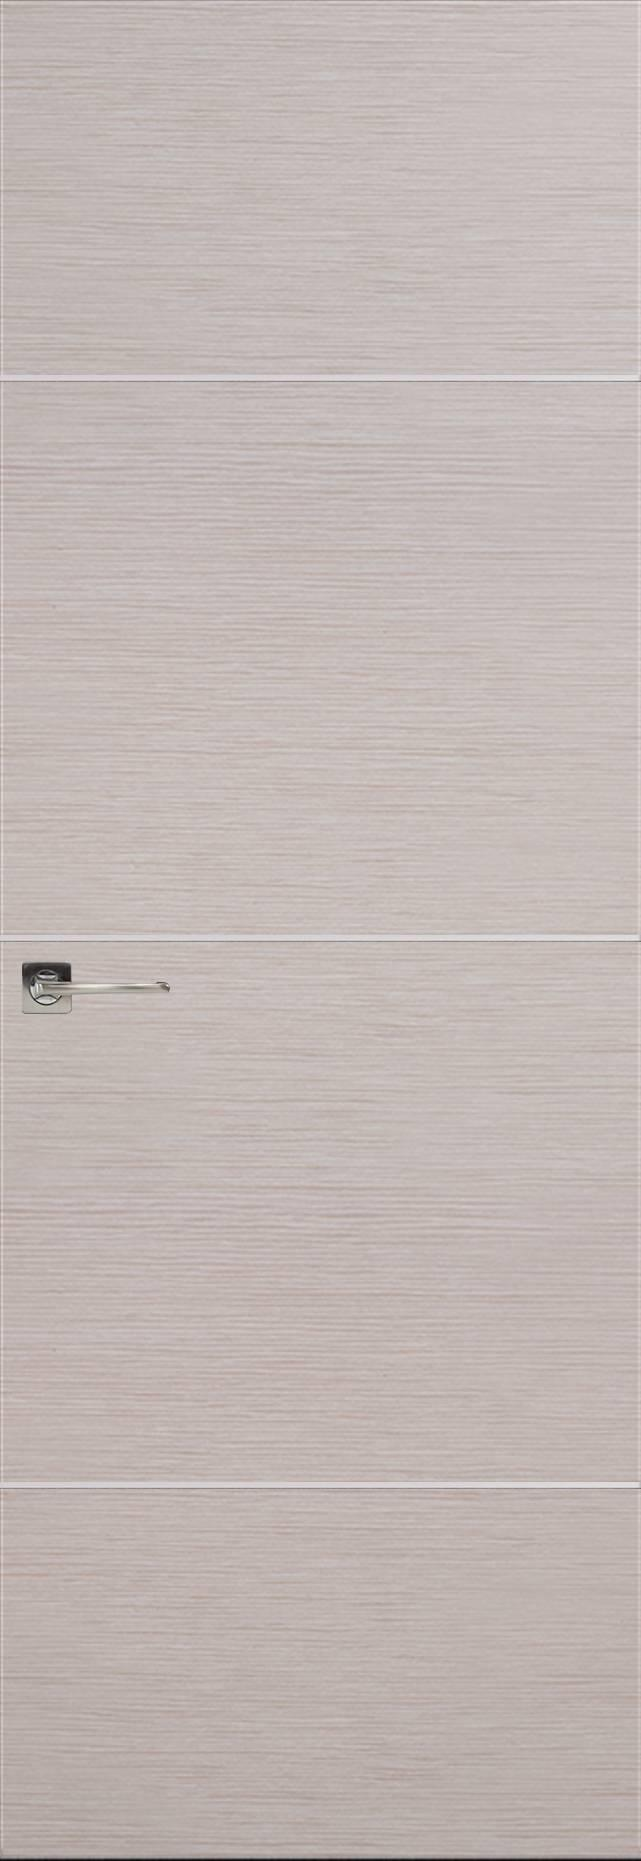 Tivoli Г-3 Invisible цвет - Дымчатый дуб Без стекла (ДГ)